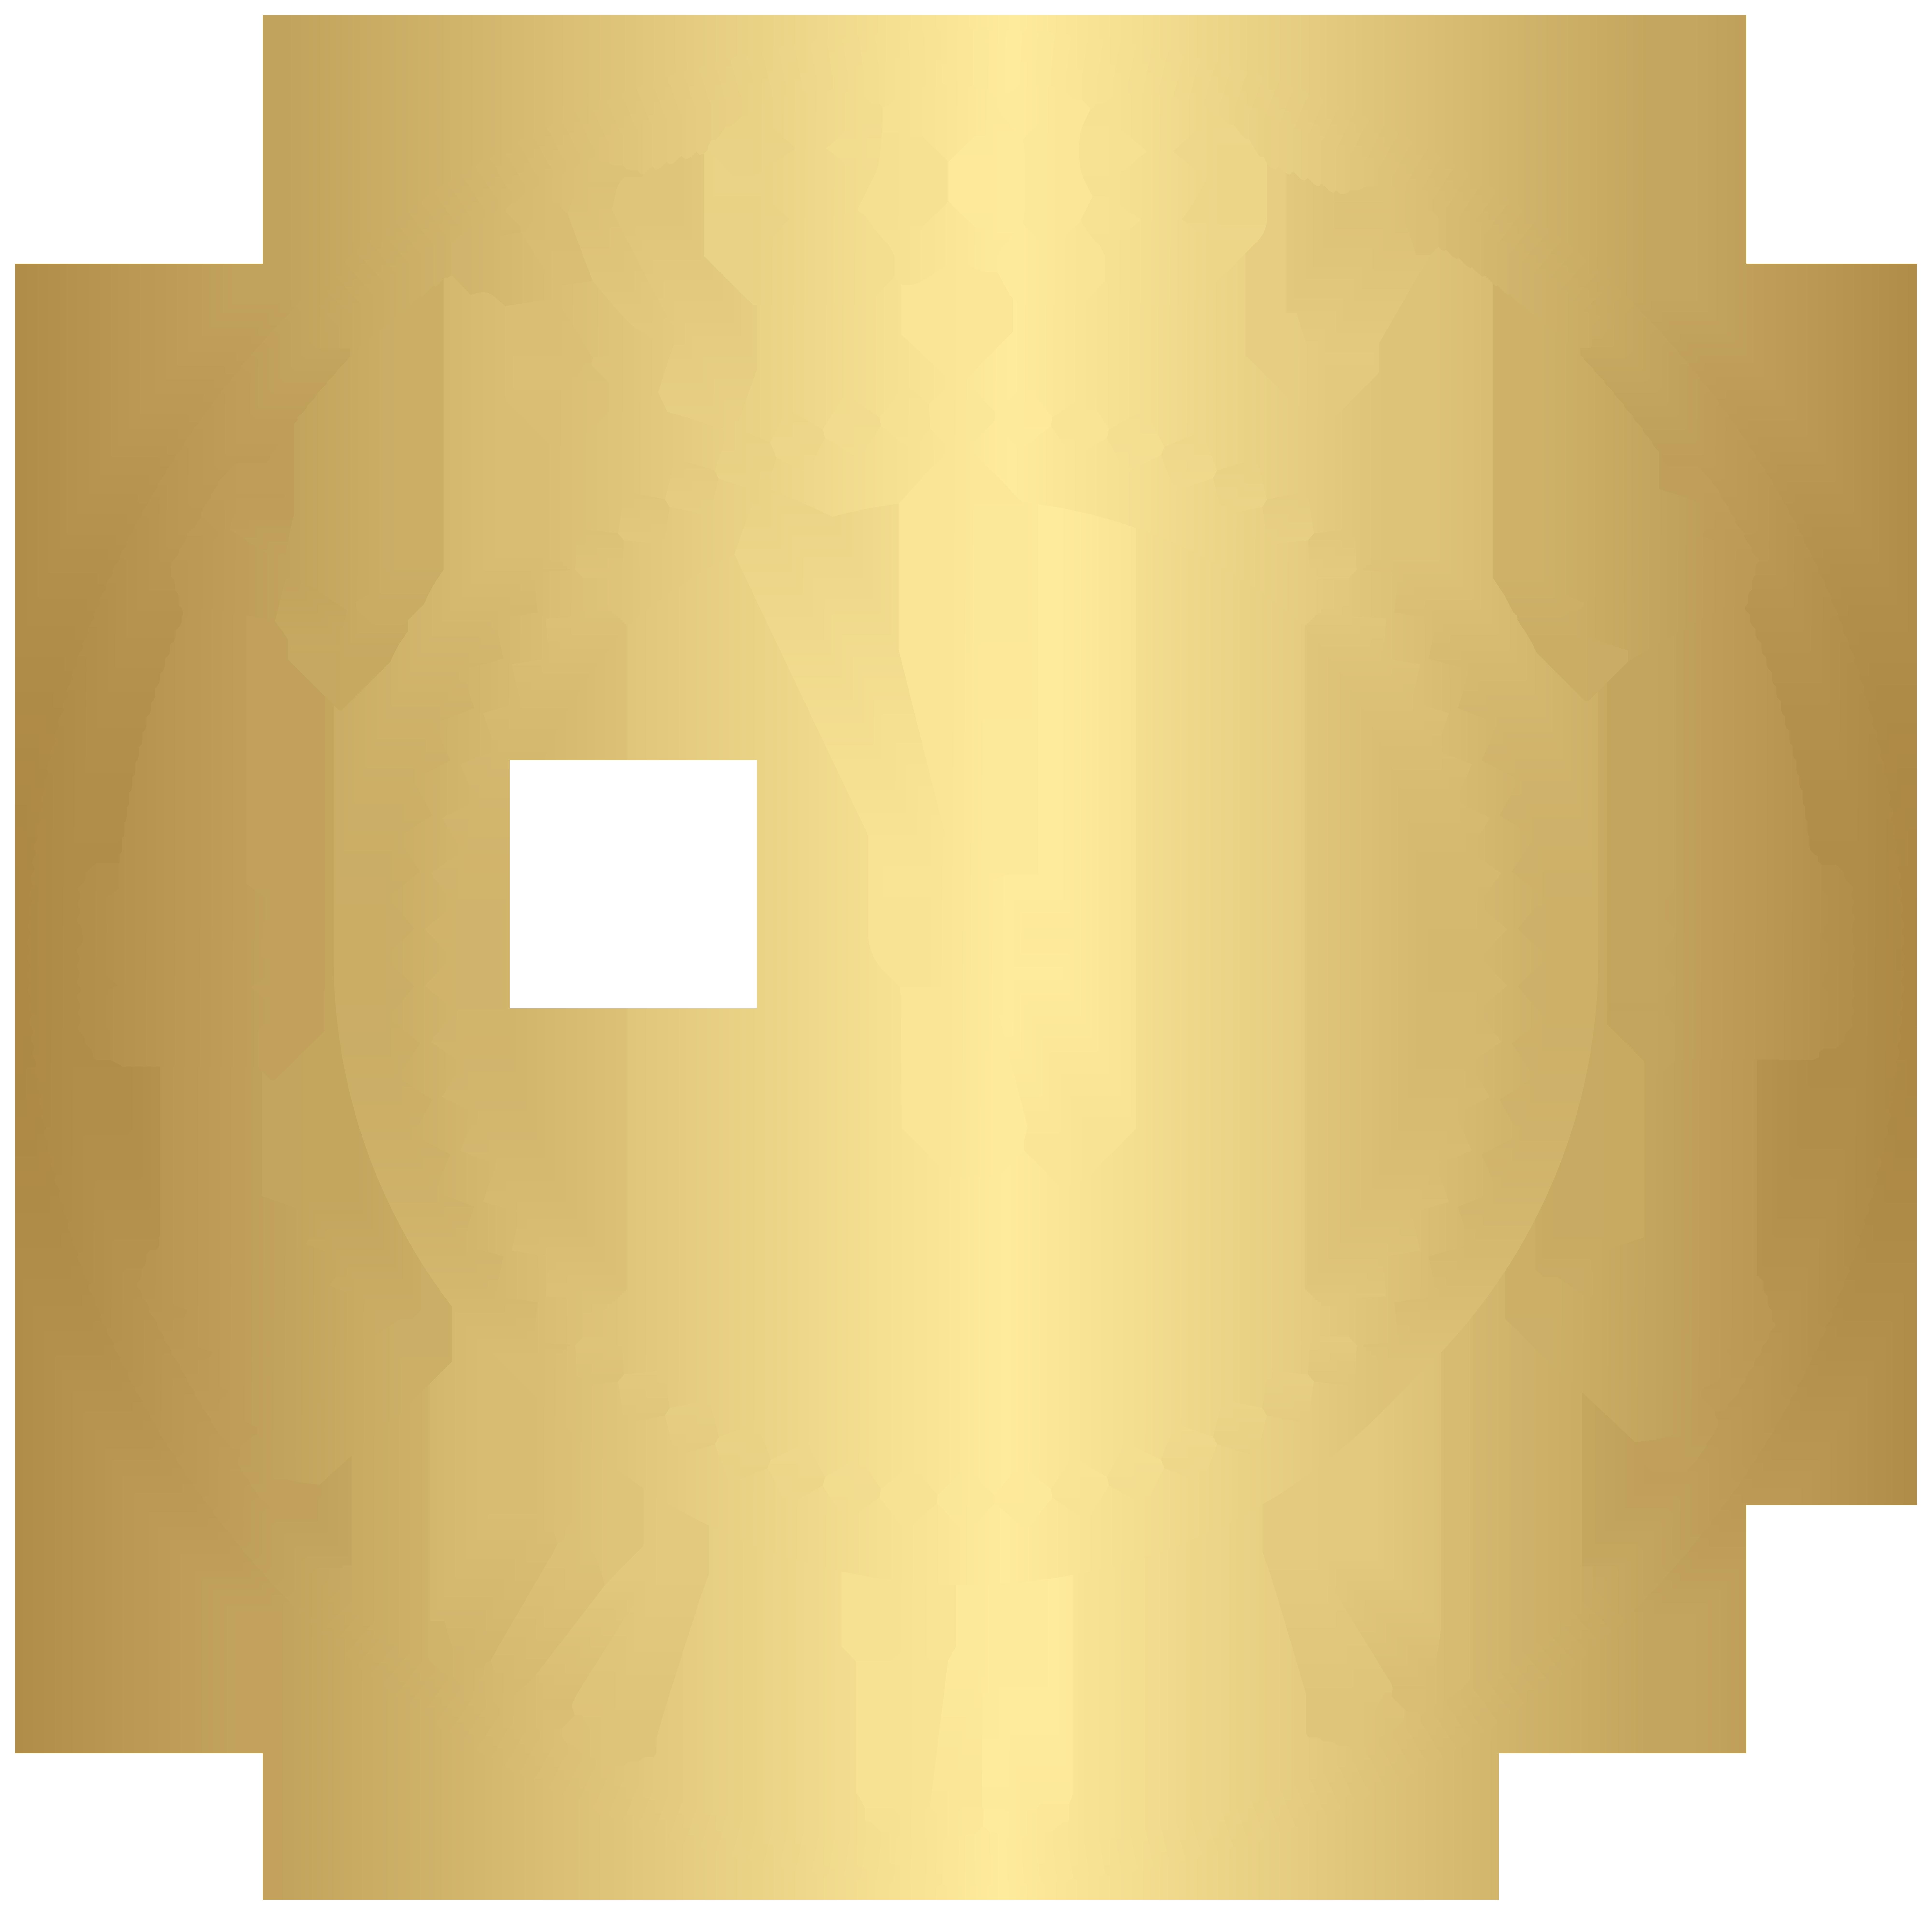 2019 Decorative New Year Clock Clip Art.